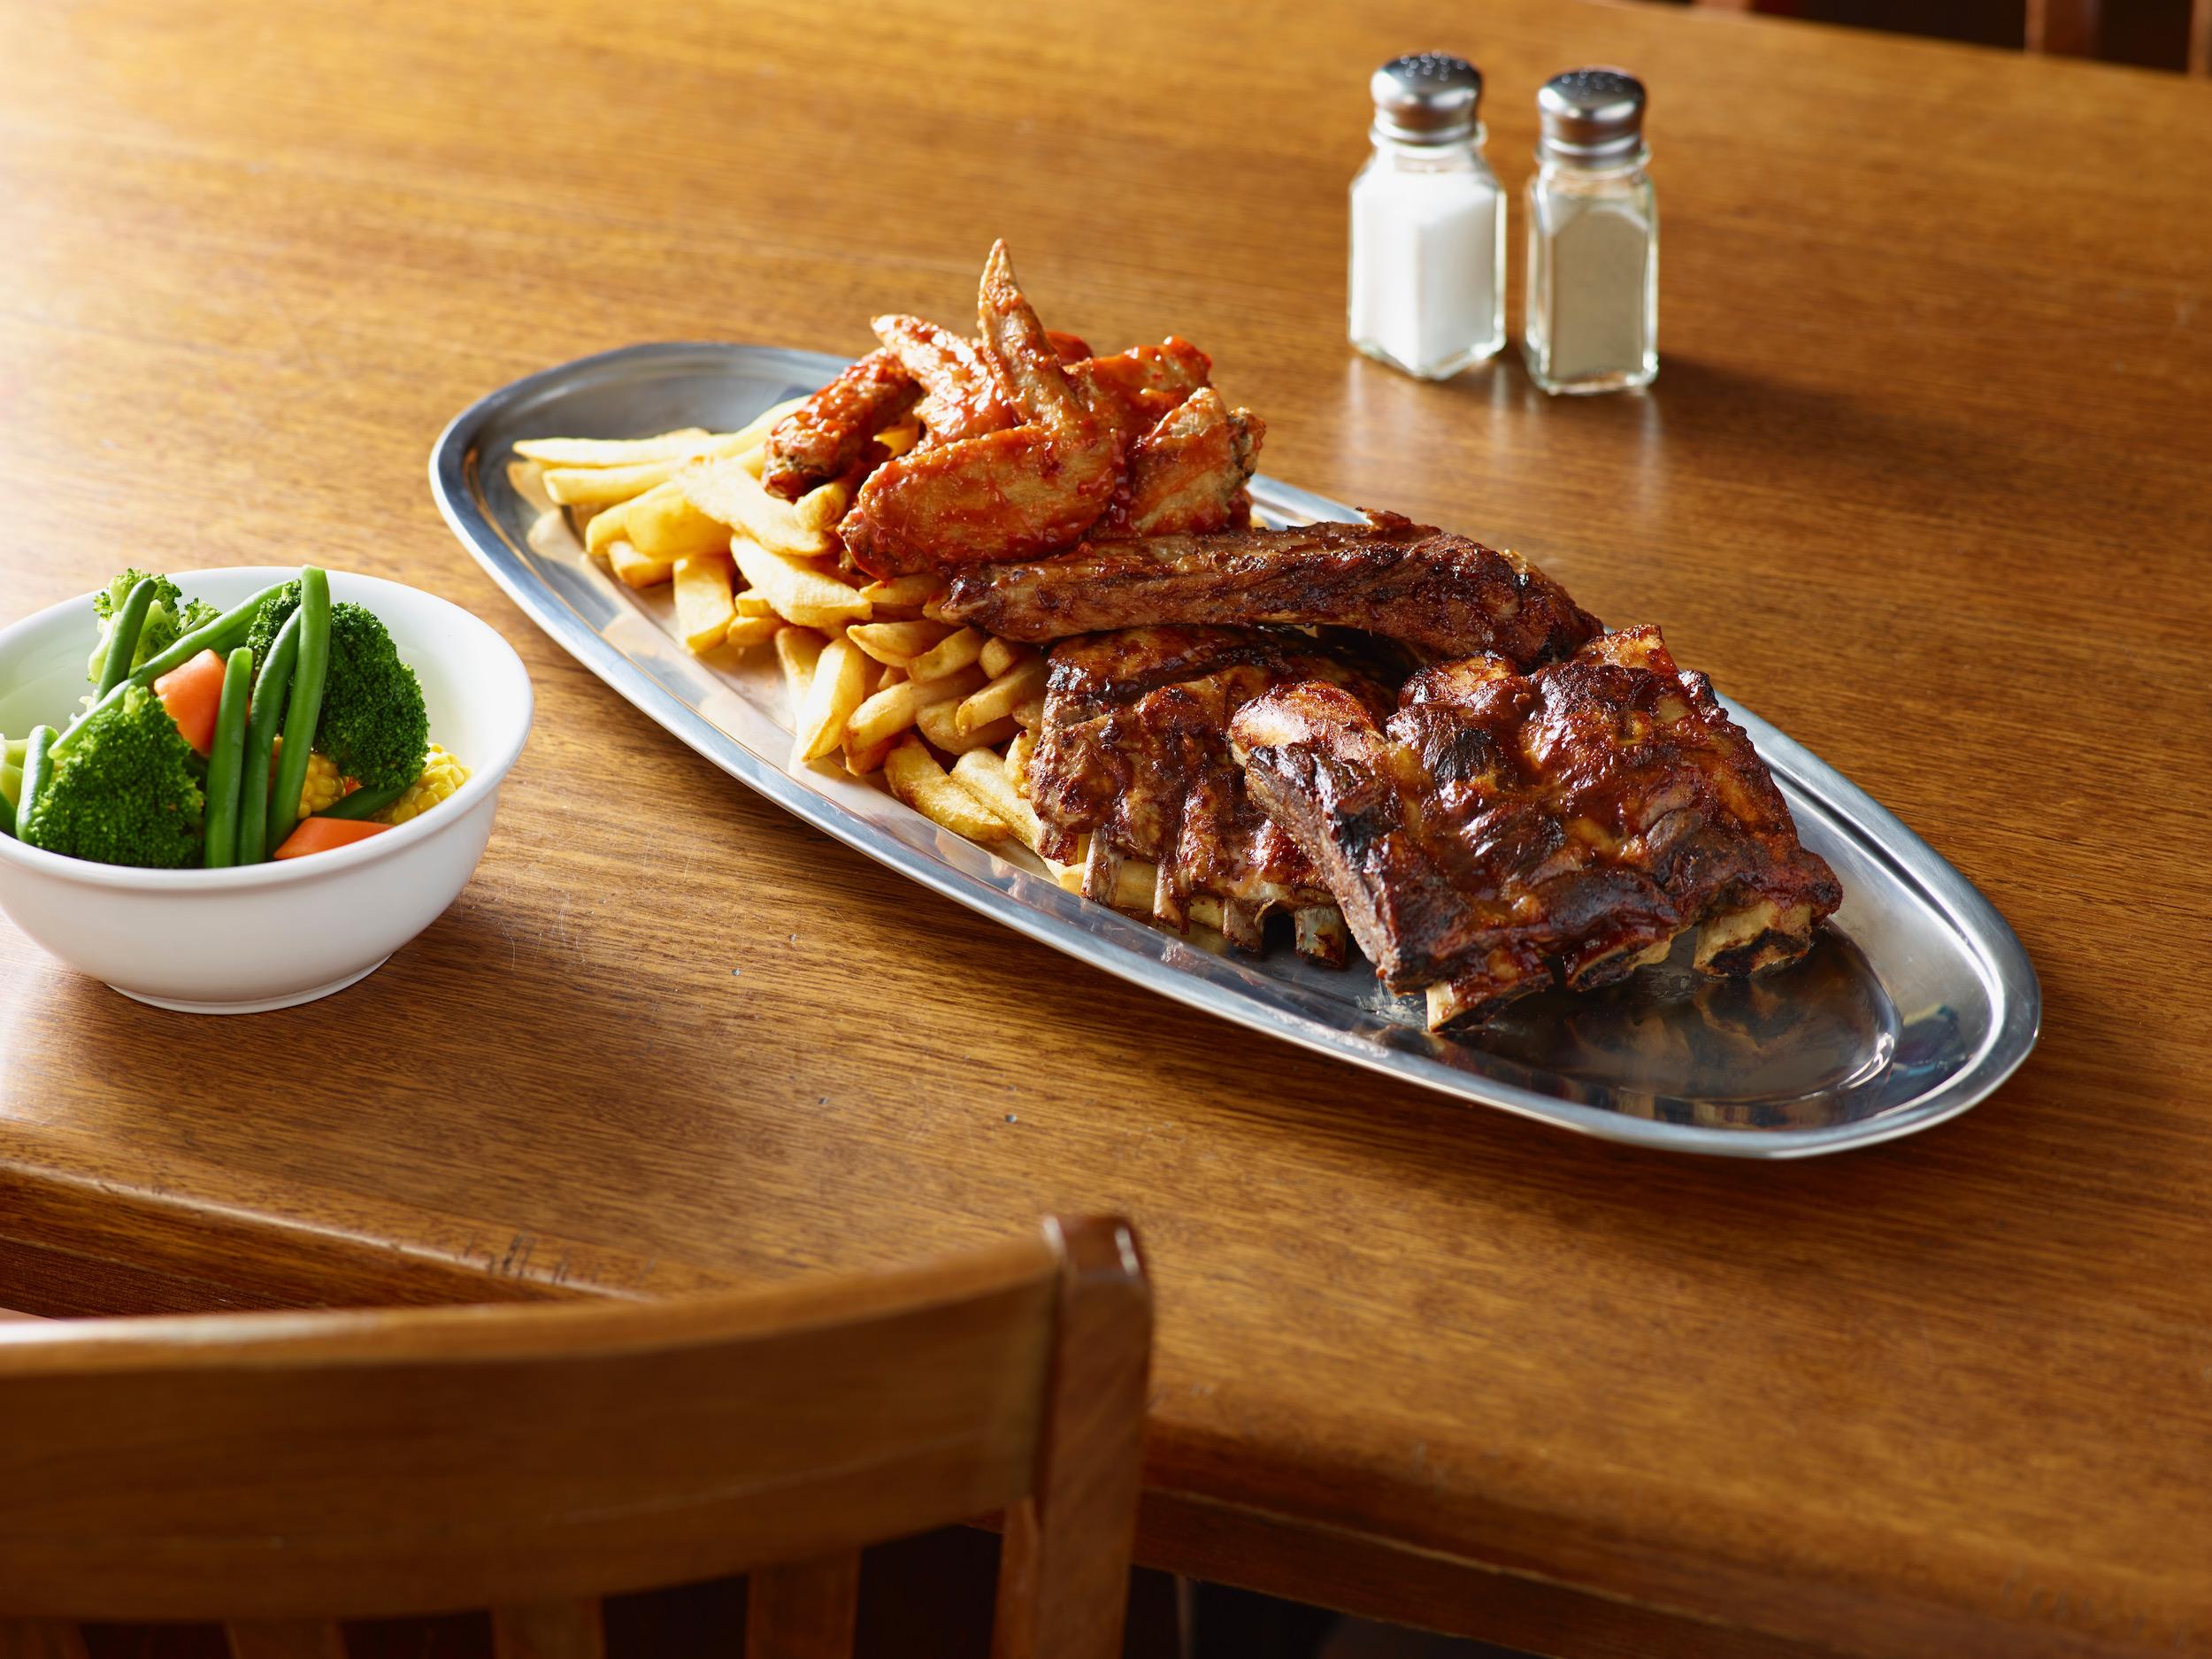 iconic-franchise-restaurant-full-training-provided-wollongong-3